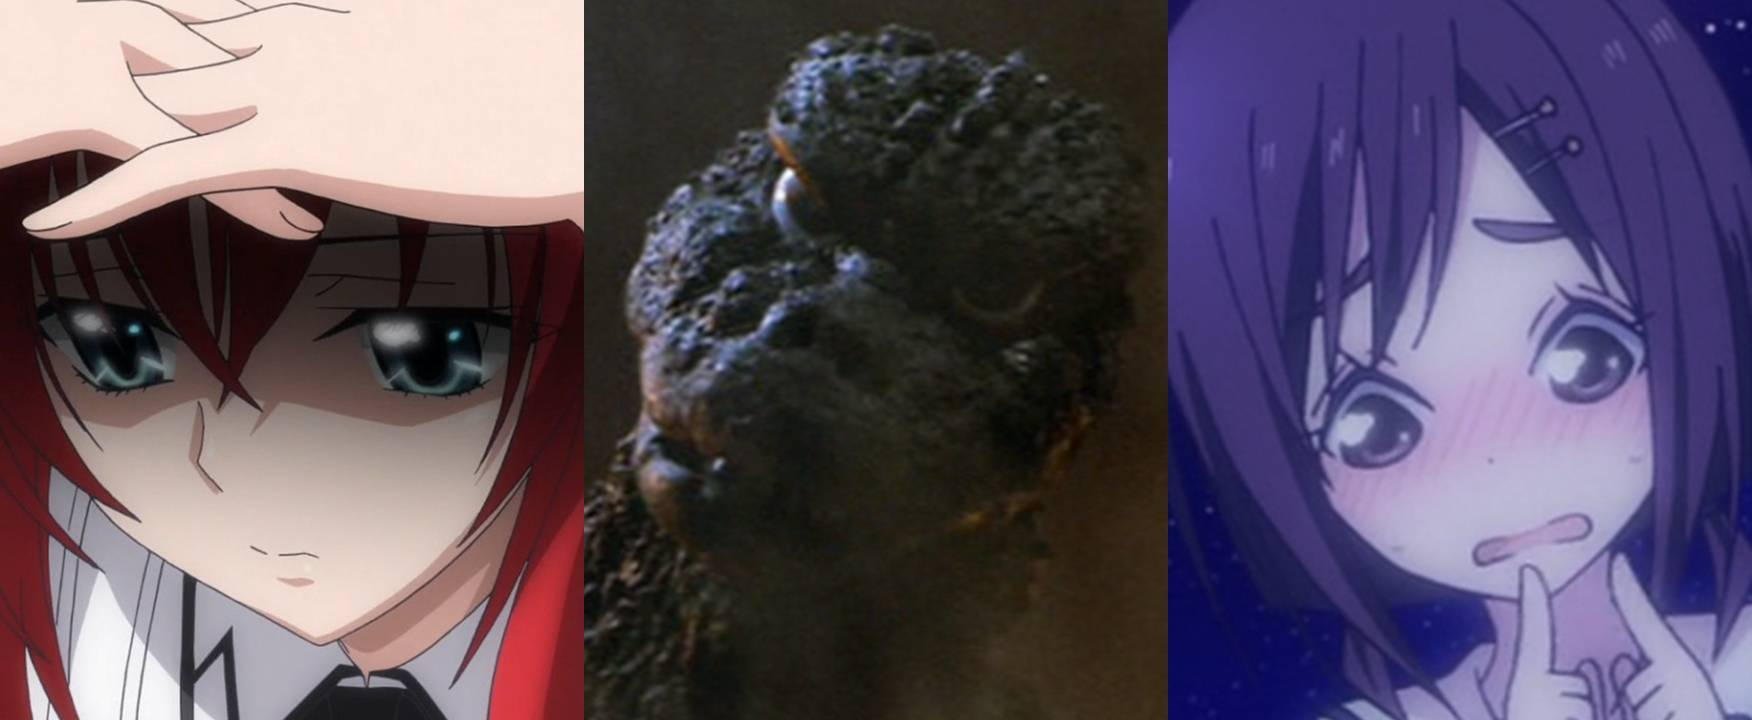 Godzilla And Two Anime Girls Embarrassed Shy By Artdog22